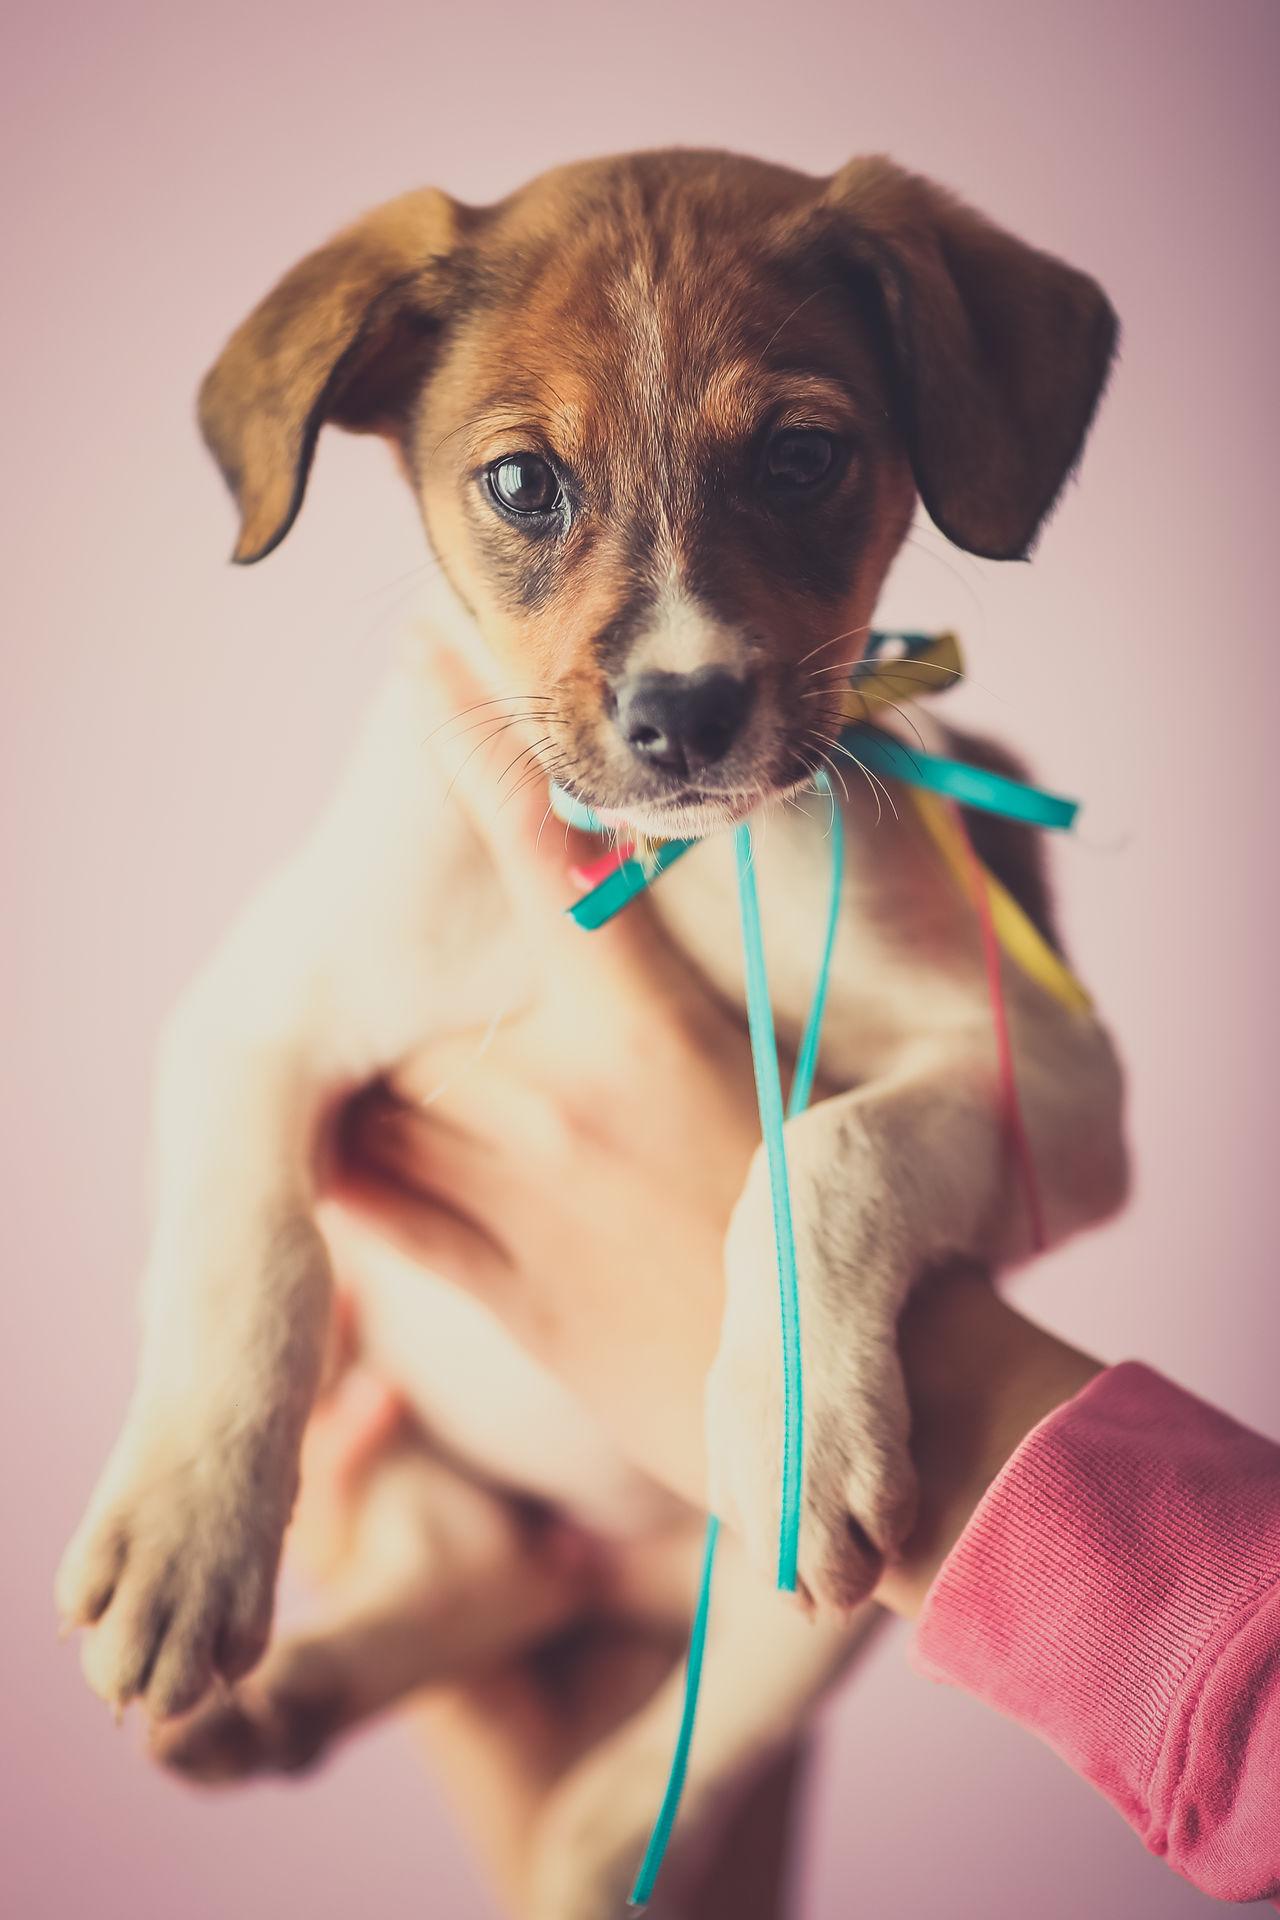 Animal Themes Dog Domestic Animals Little One Animal Pet Pets